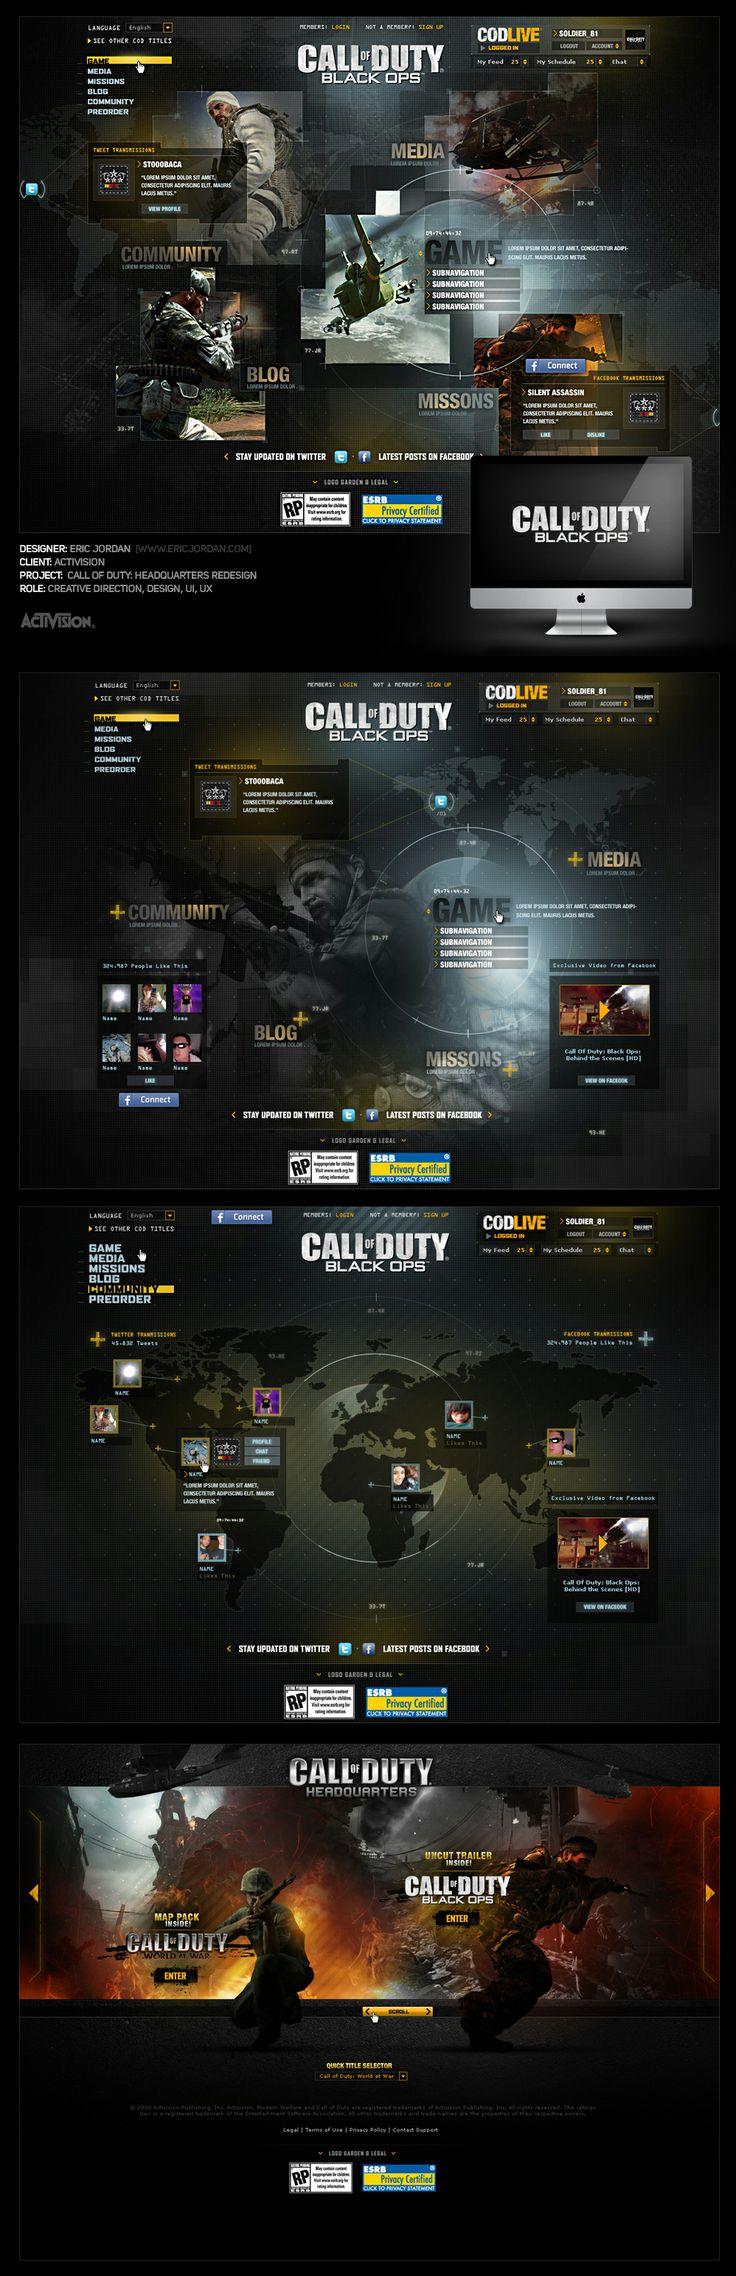 Call of Duty: Black Ops / CODLive Pitch - Designed By Eric Jordan of 2Advanced Studios (www.ericjordan.com)